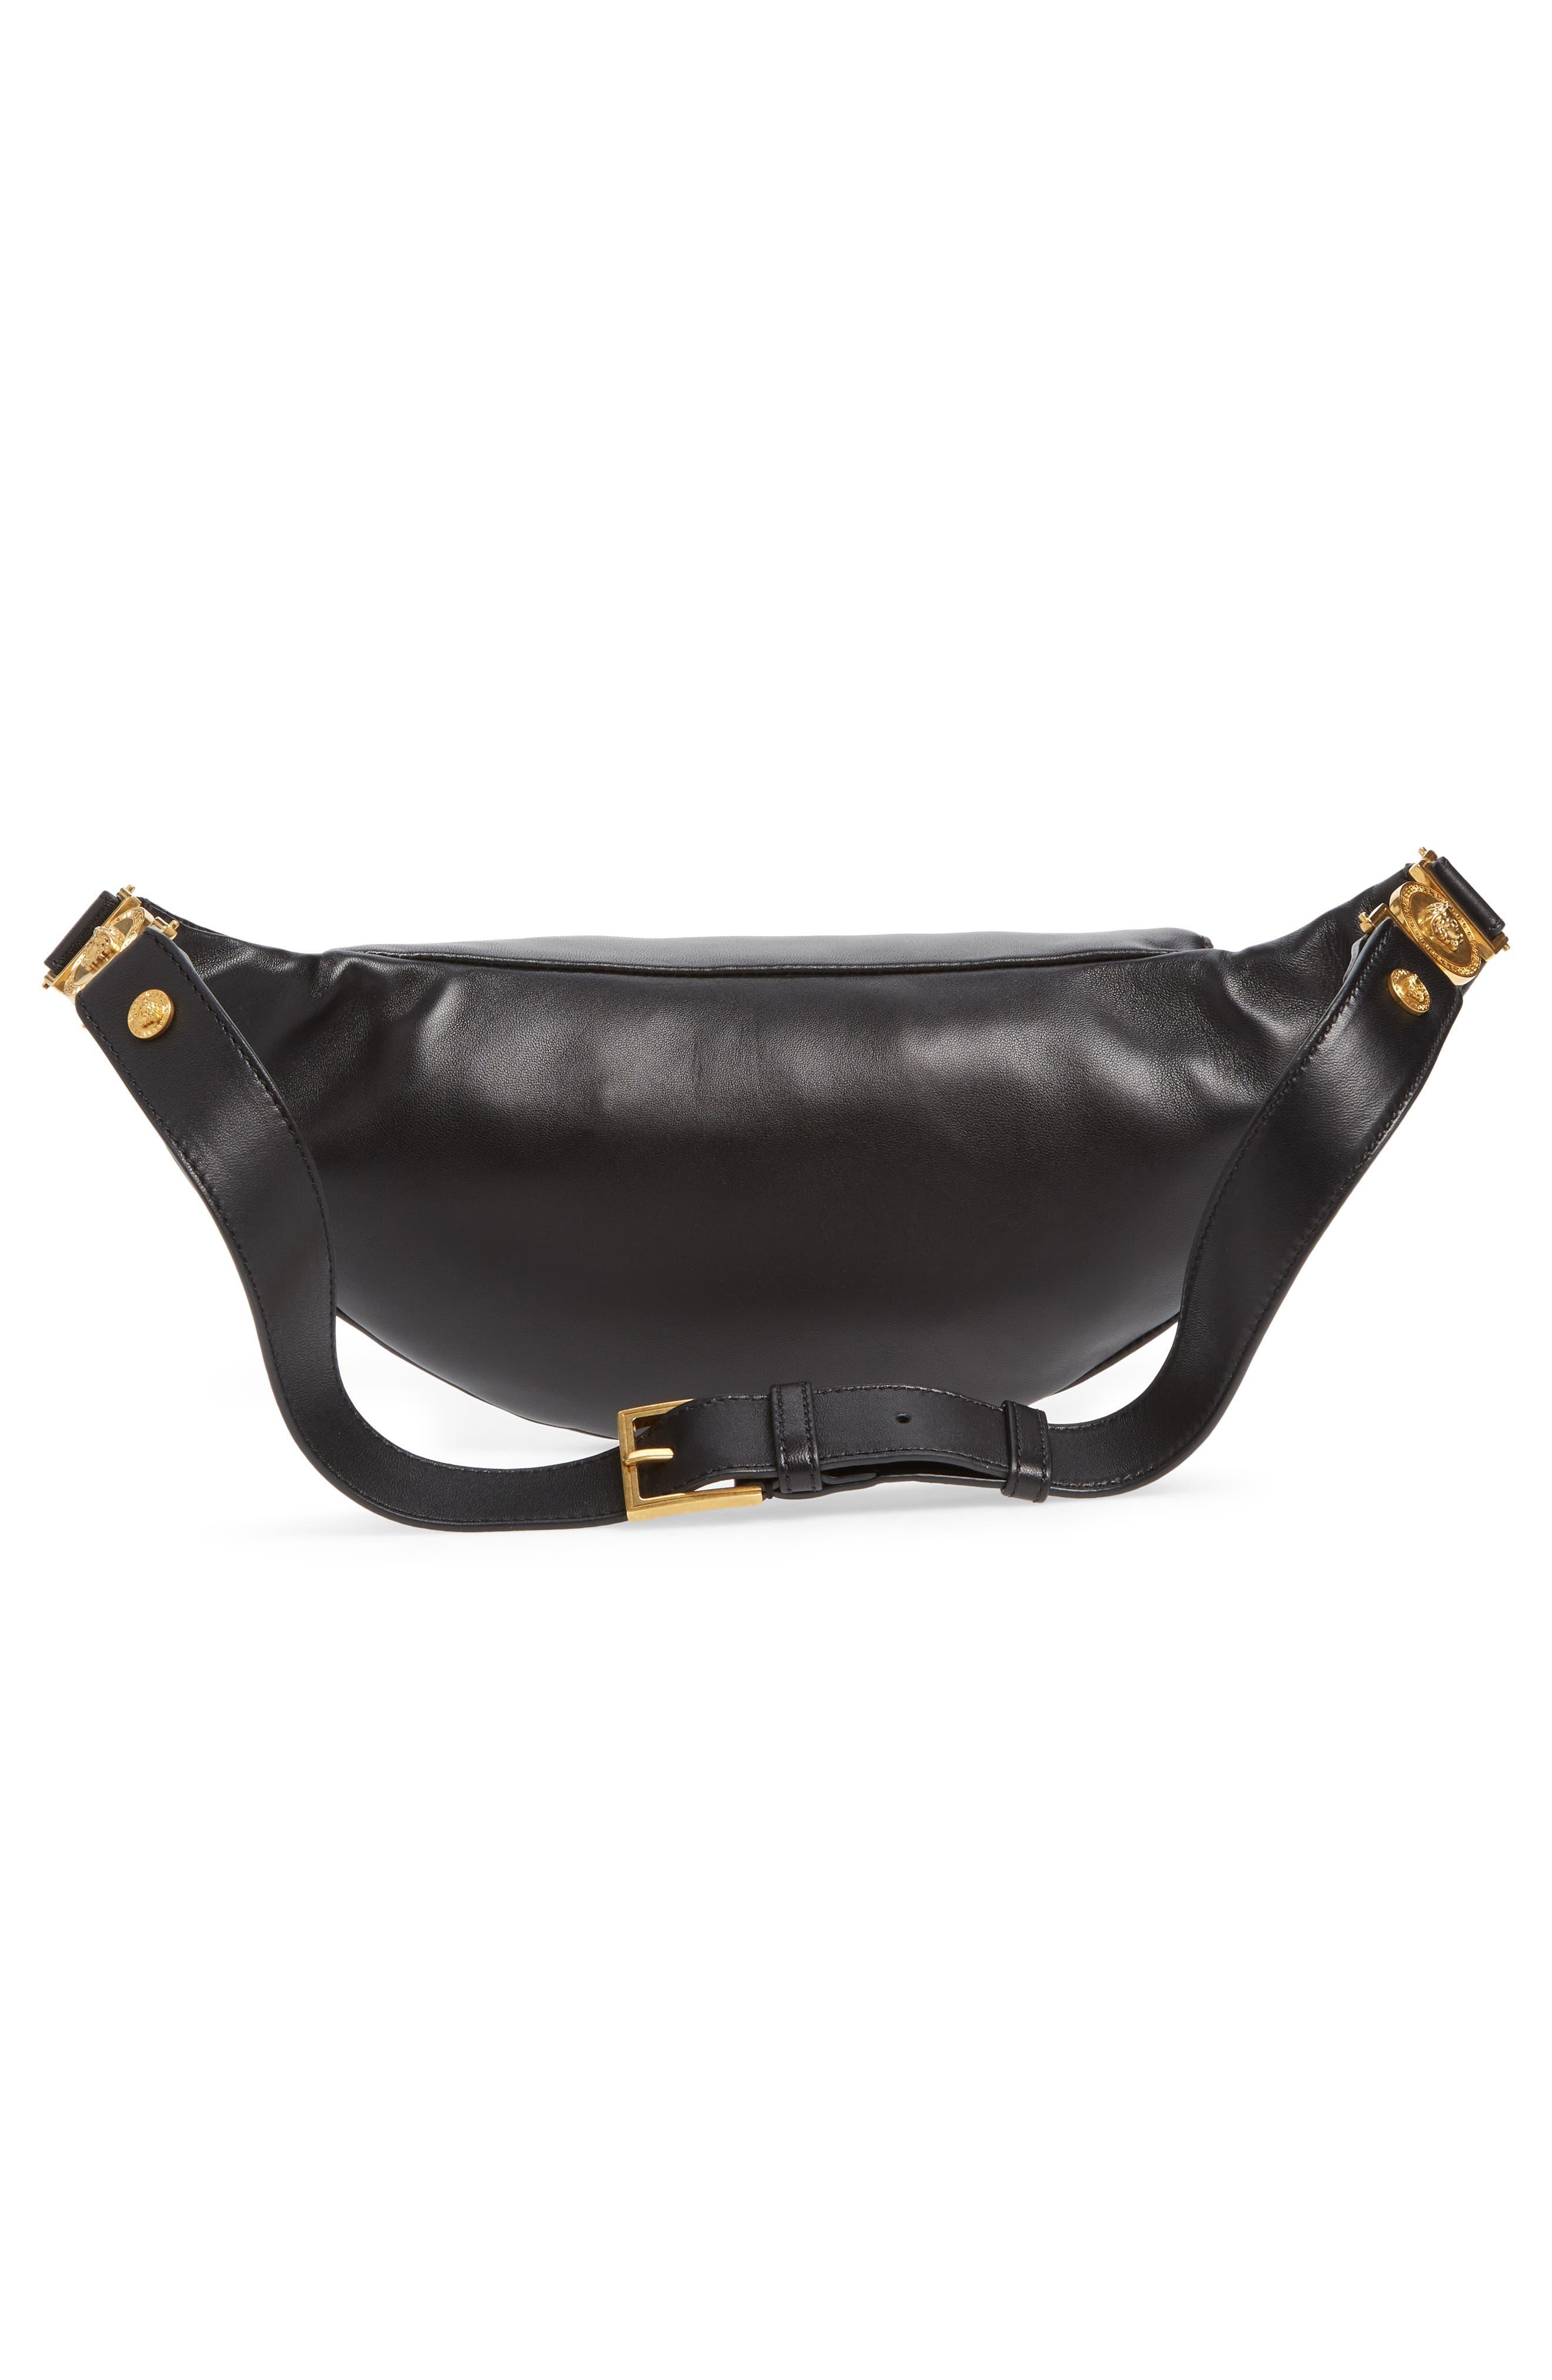 VERSACE COLLECTION,                             Versace Crystal Embellished Leather Belt Bag,                             Alternate thumbnail 4, color,                             NERO